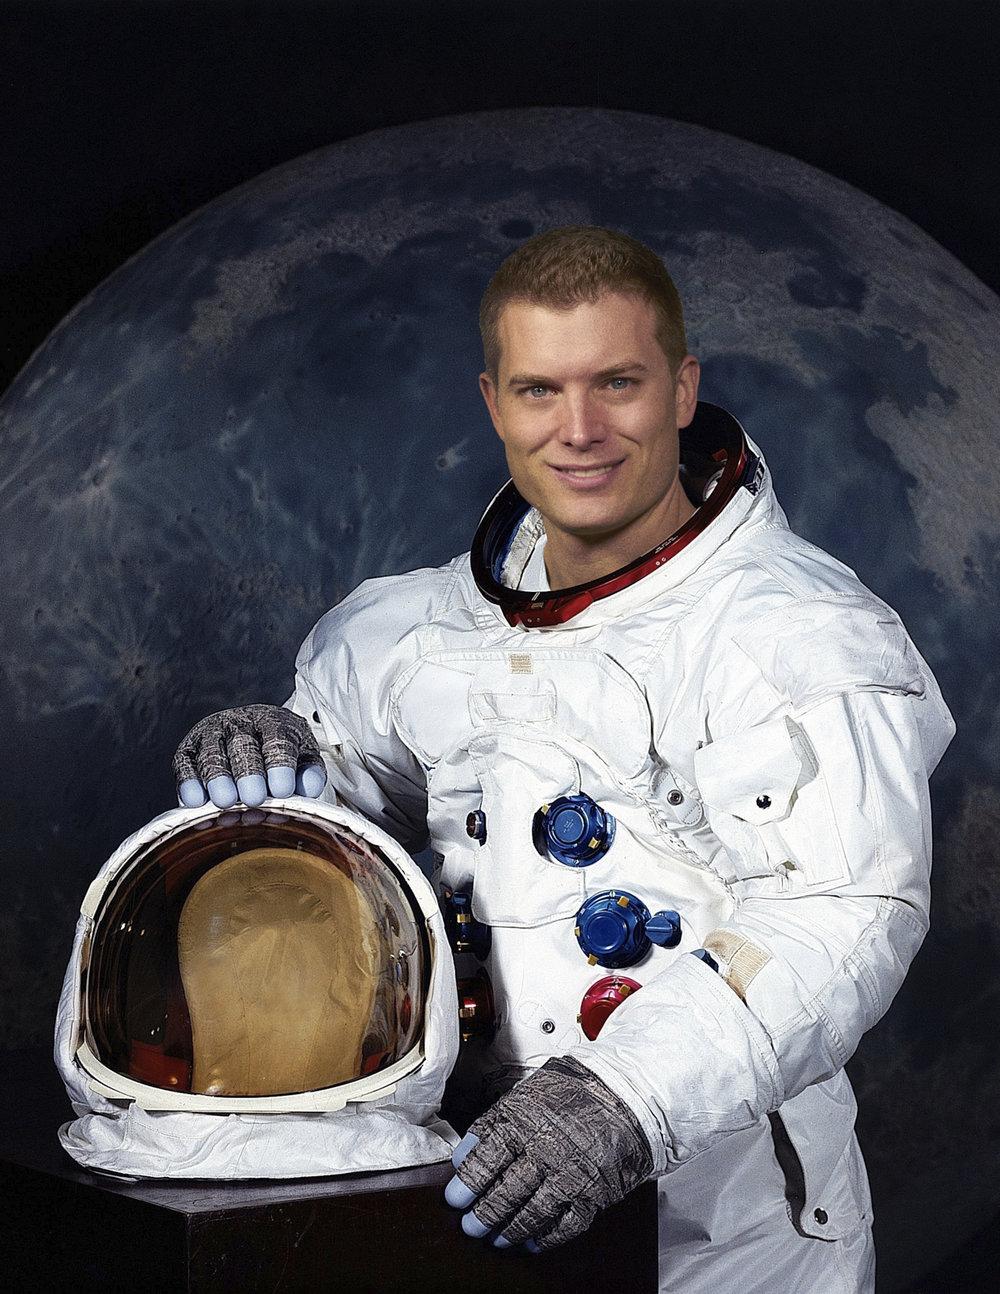 astronauts_46.jpg